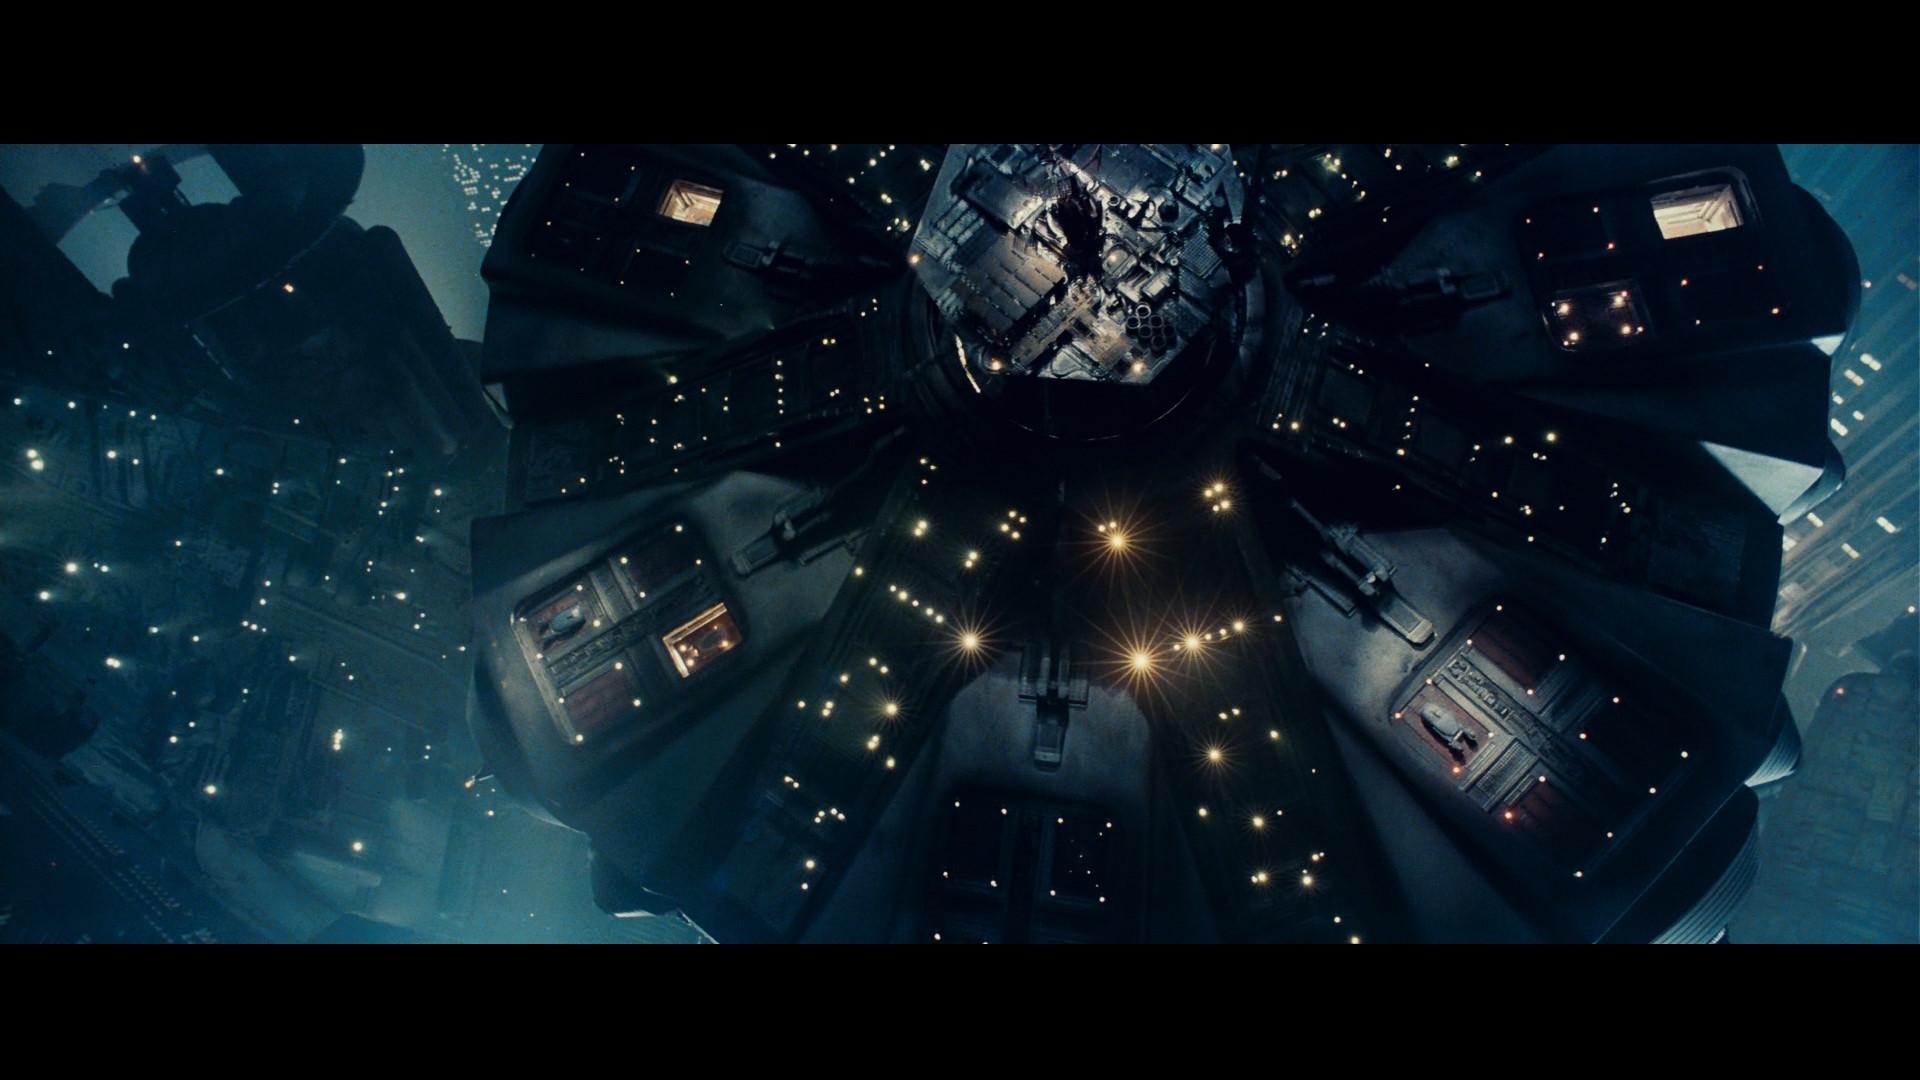 BLADE RUNNER drama sci-Fi thriller action city km_PNG wallpaper |  | 224082 | WallpaperUP